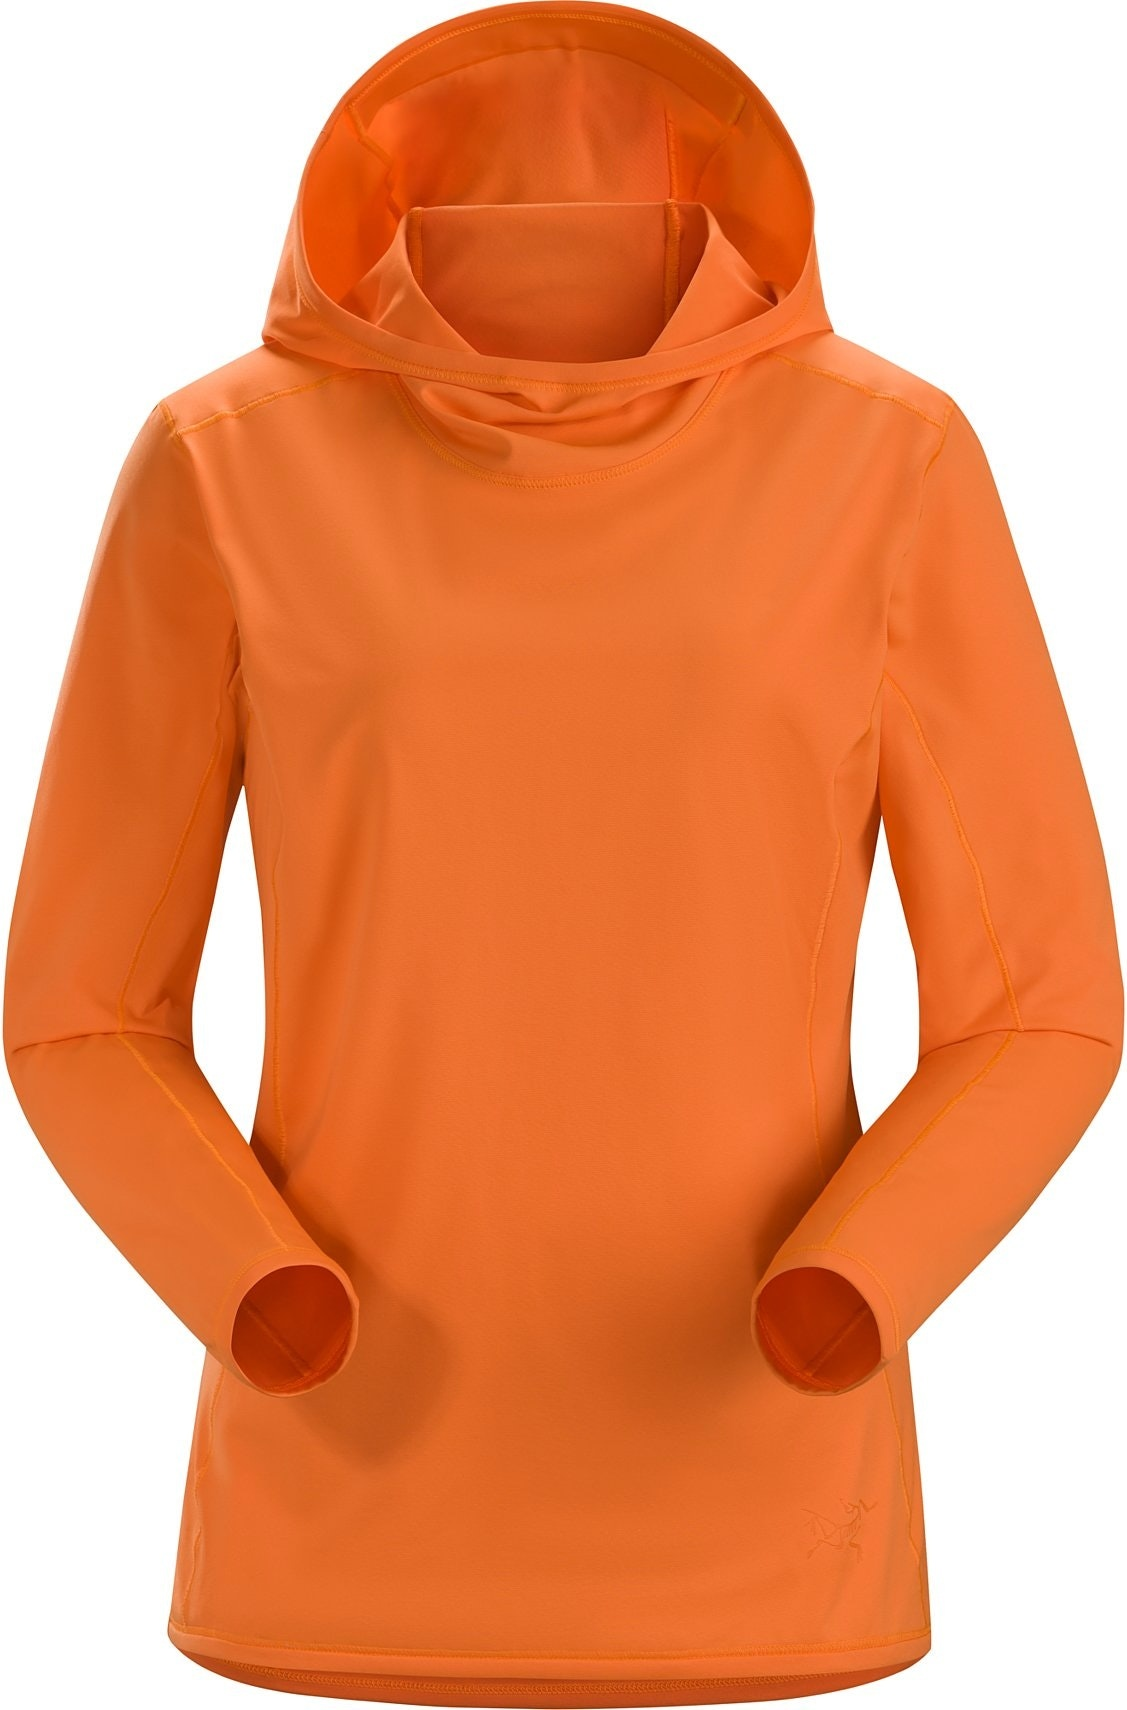 Футболка Arcteryx Phasic Sun Hoody женская оранжевая